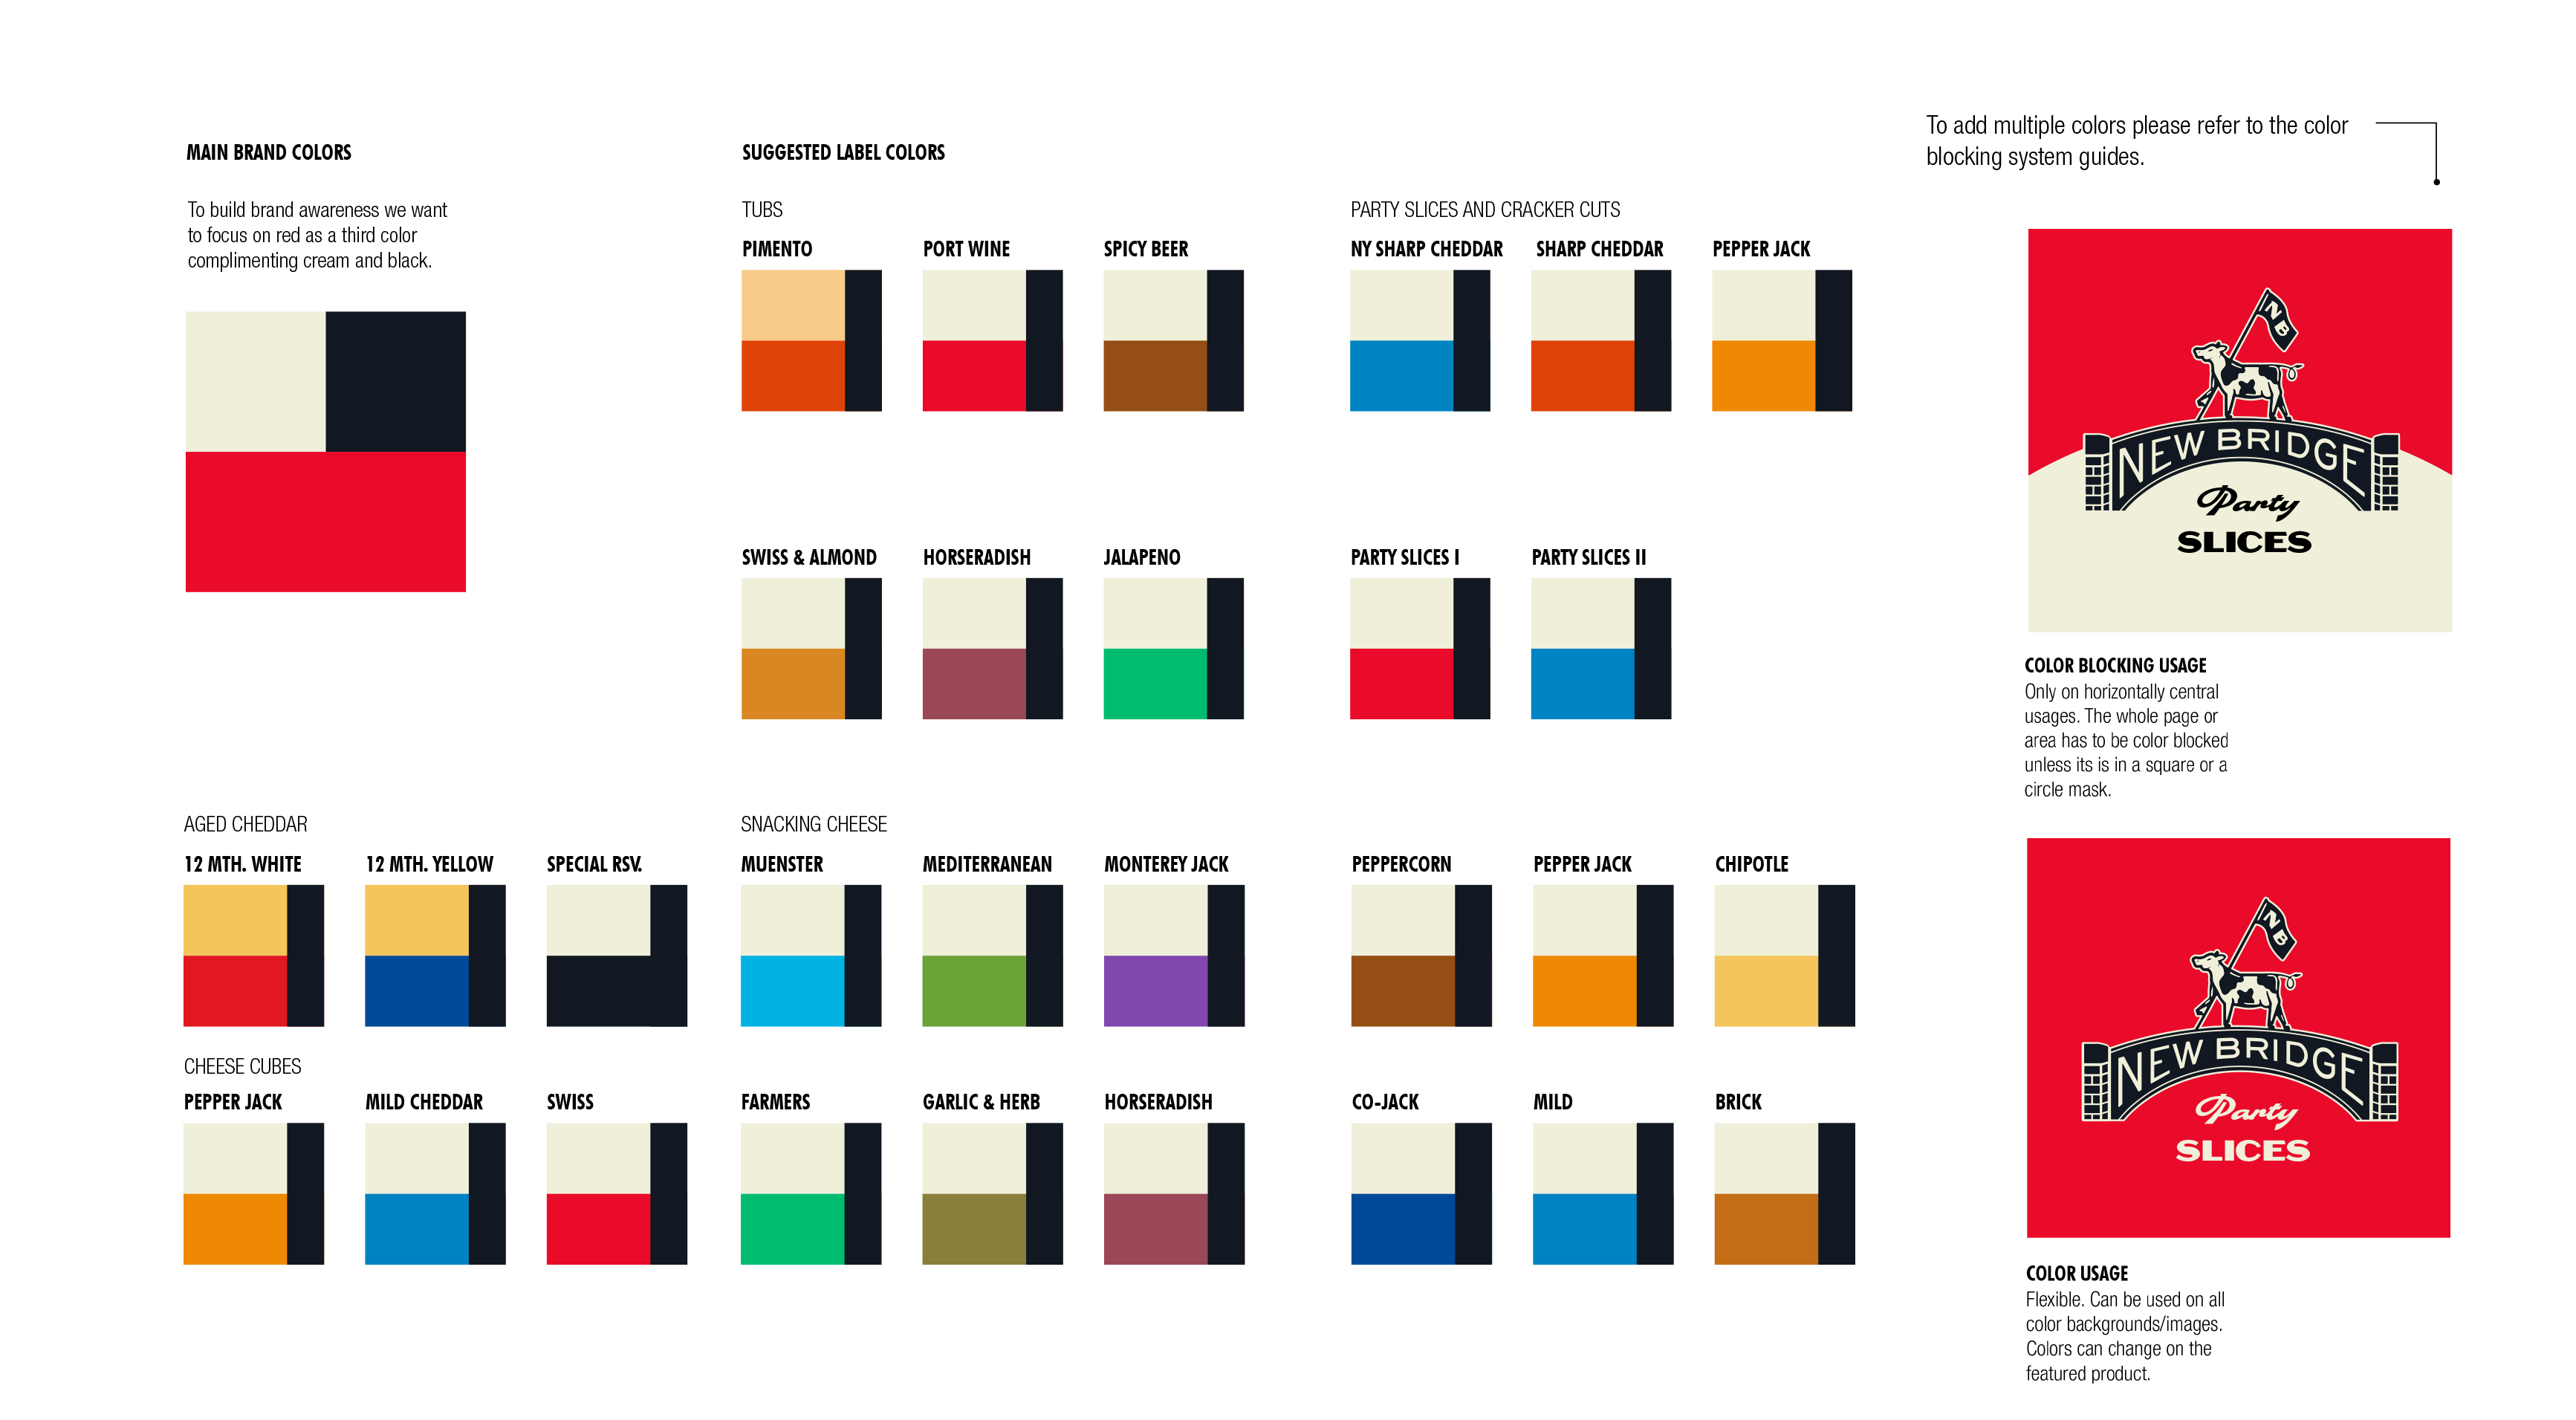 overall-color-packaging-2-guideline-new-bridge-cheese-design-exploration-zeki-michael-design-cheese-cow-spread-tub-sku-range-agency-branding copy